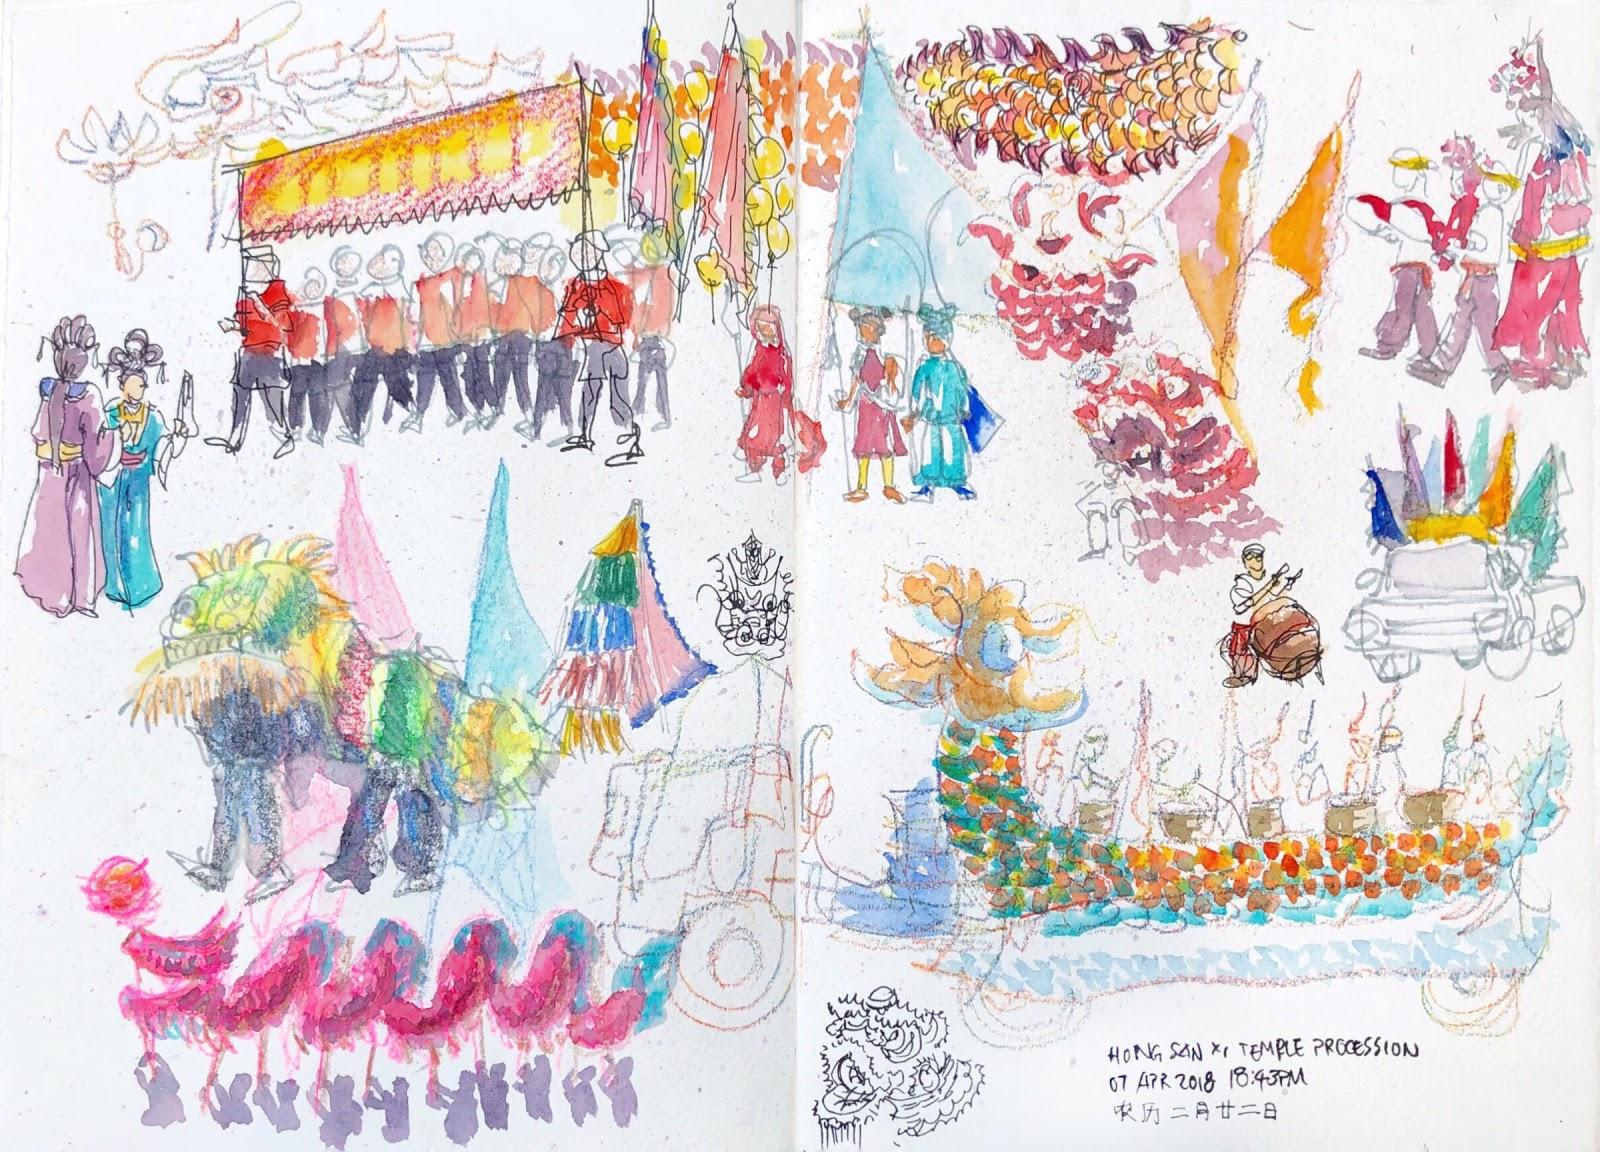 Kueh Seng Onn Temple Procession | Urban Sketchers